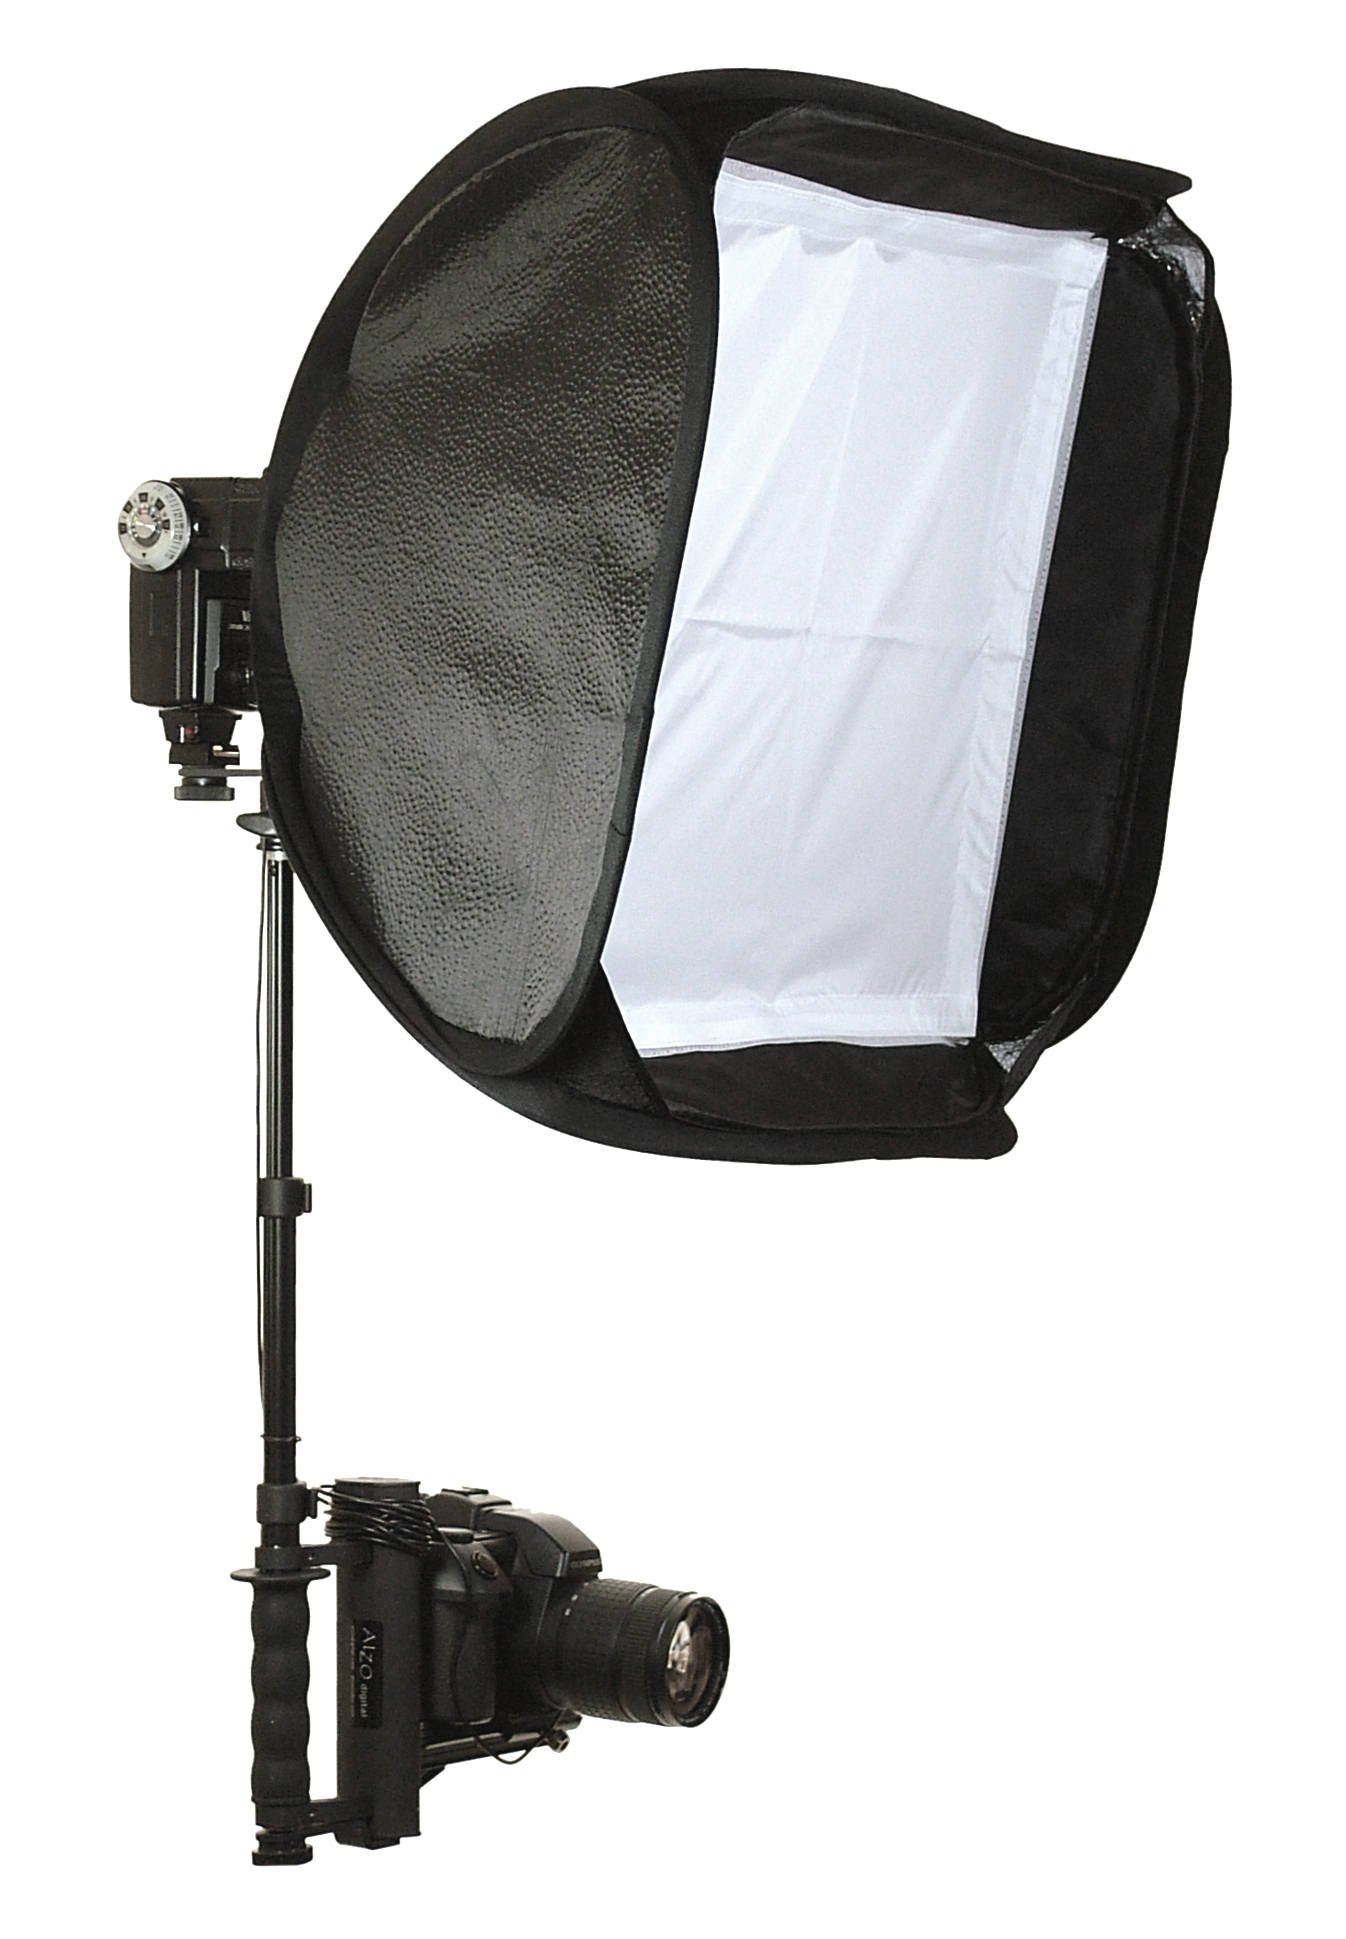 Alzo Flip Flash Bracket Softbox Kit (Black)- for All Dslrs by ALZO digital